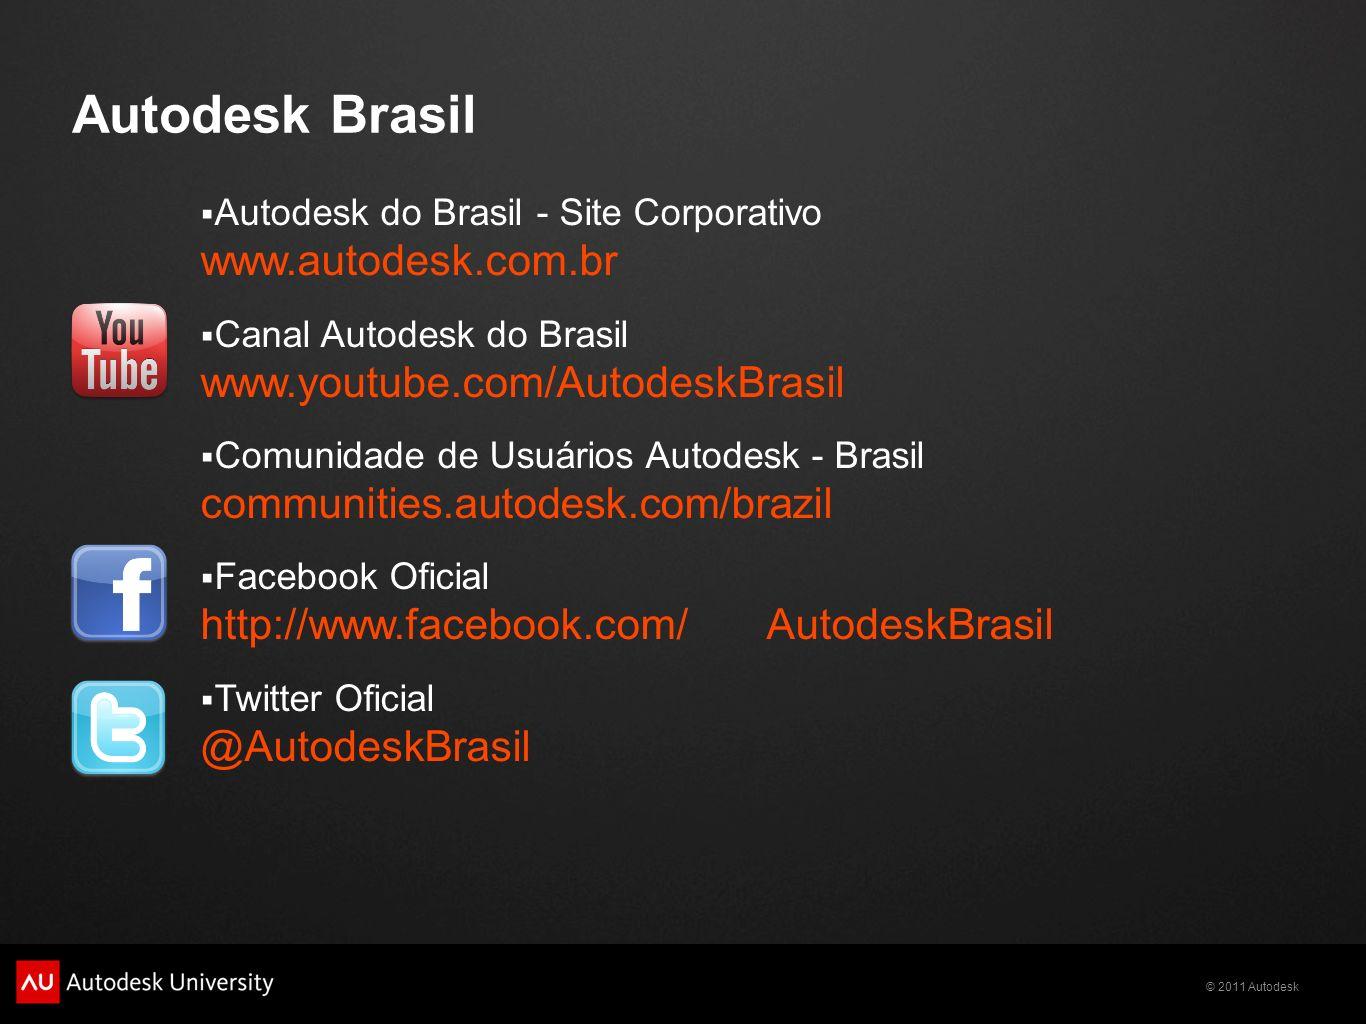 © 2011 Autodesk Autodesk Brasil Autodesk do Brasil - Site Corporativo www.autodesk.com.br Canal Autodesk do Brasil www.youtube.com/AutodeskBrasil Comu